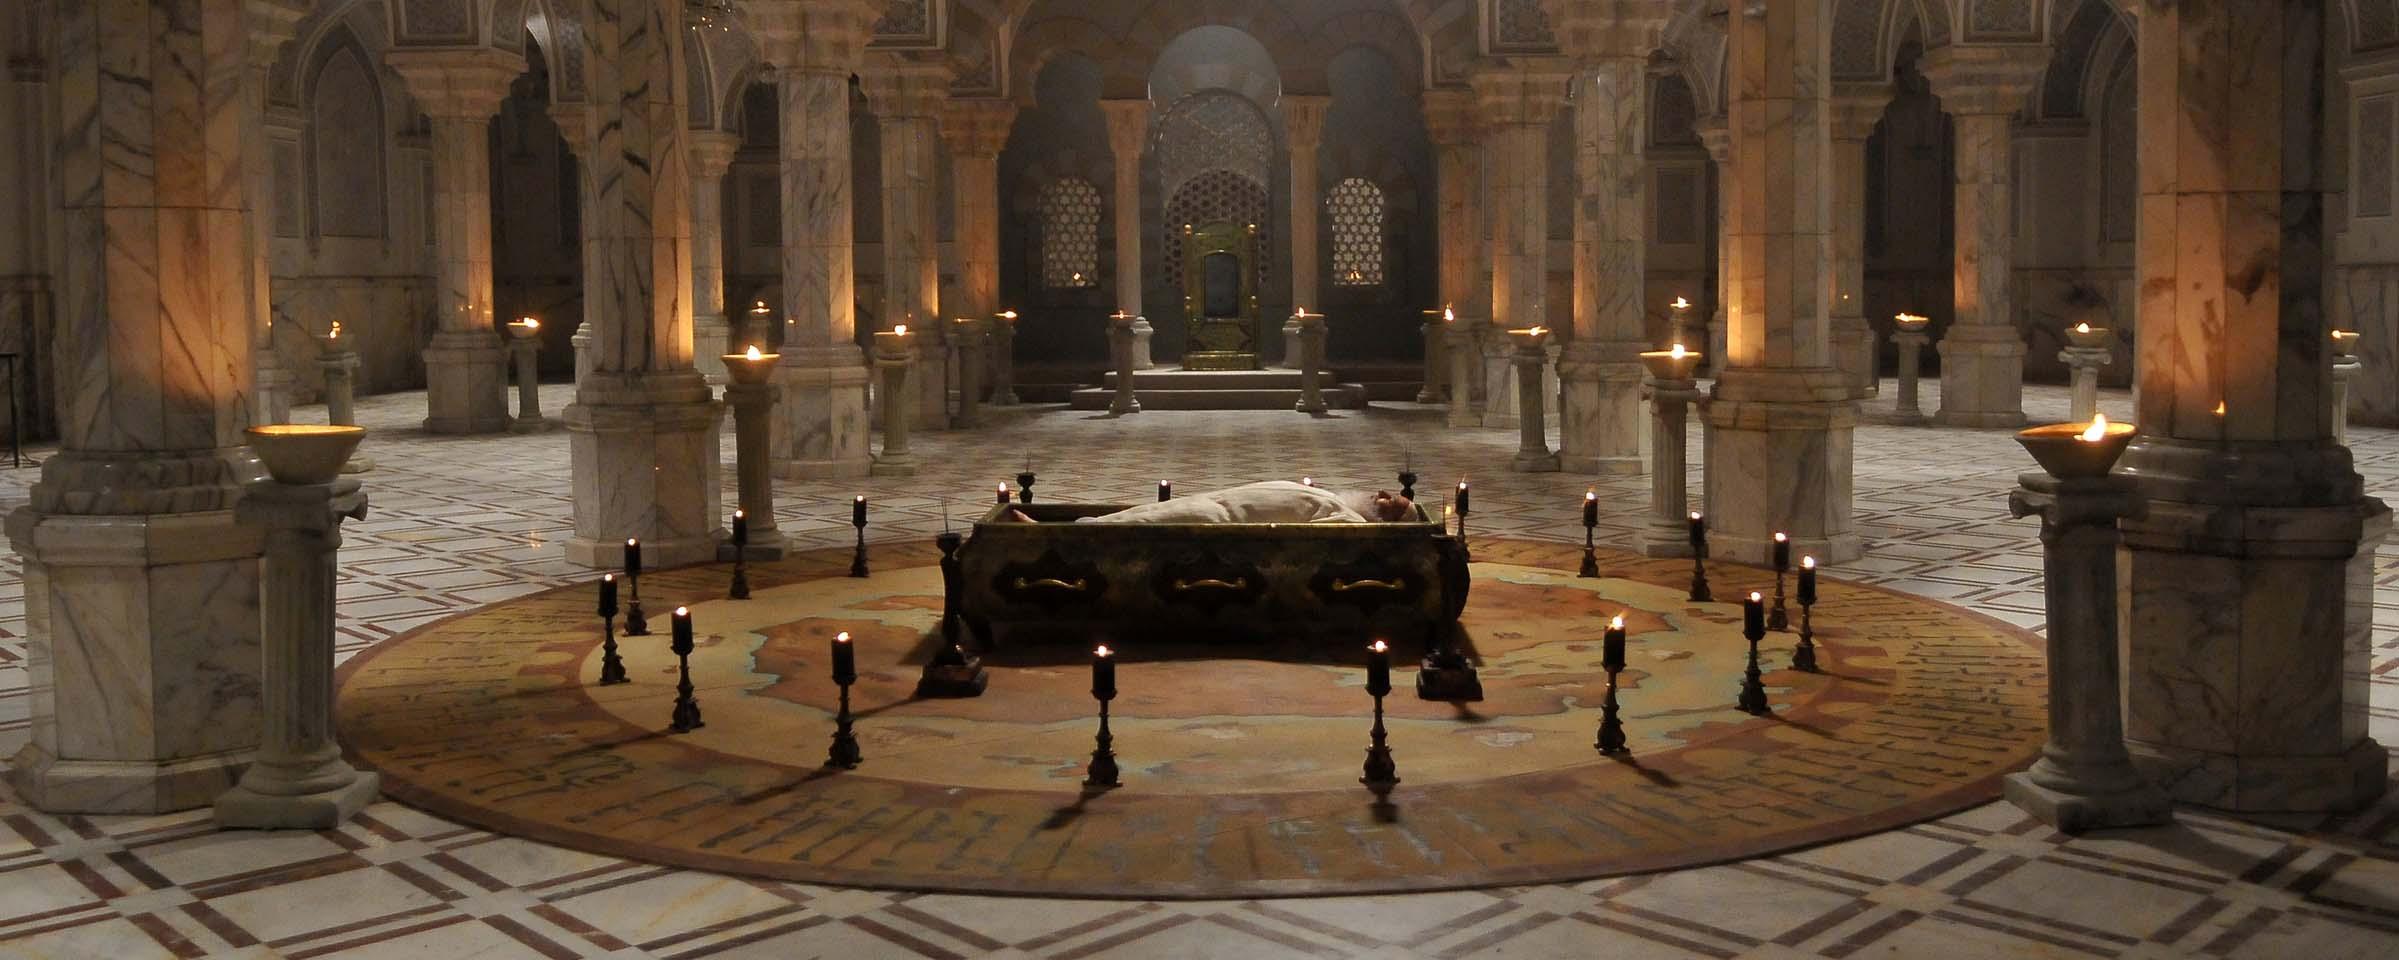 تصاویر فیلم رستاخیز (قسمت چهارم )